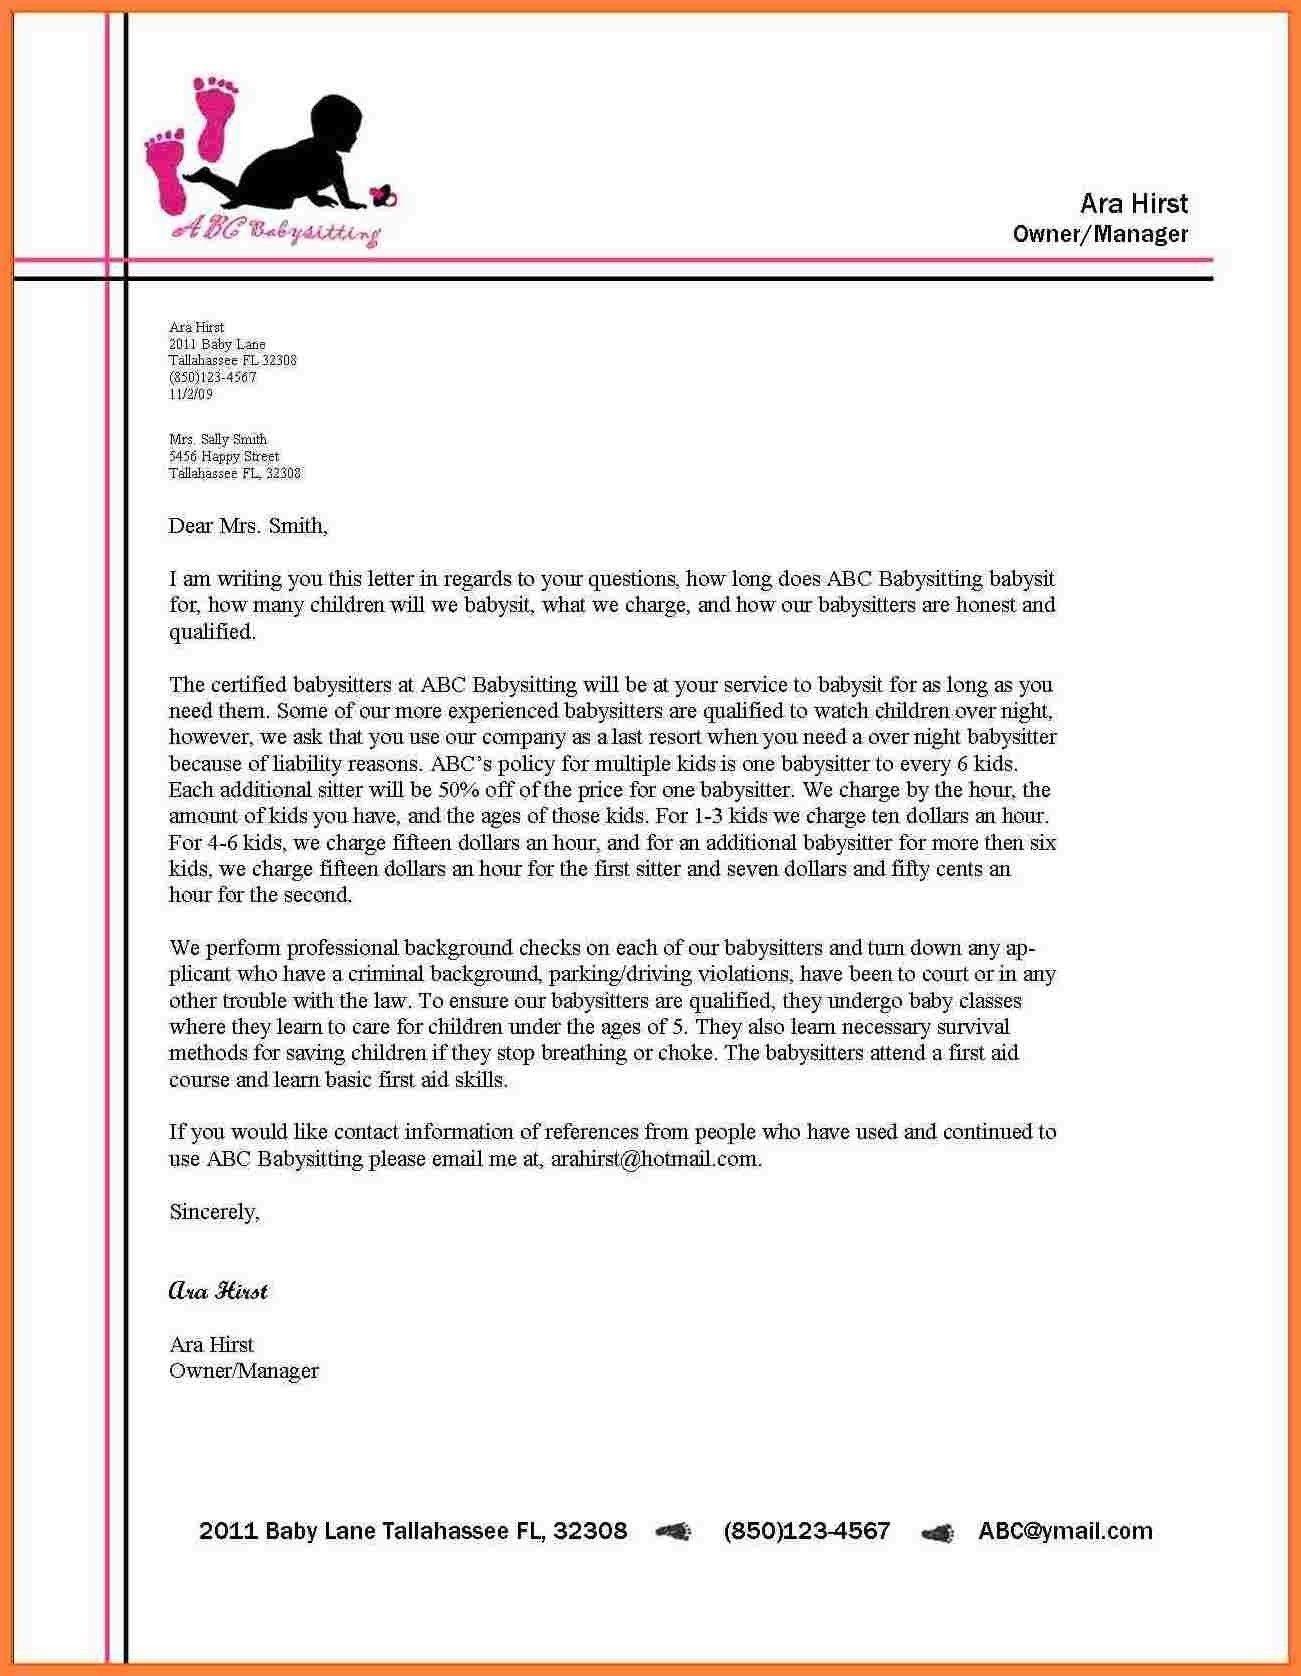 Business Letter Letterhead Business Letter Format Business